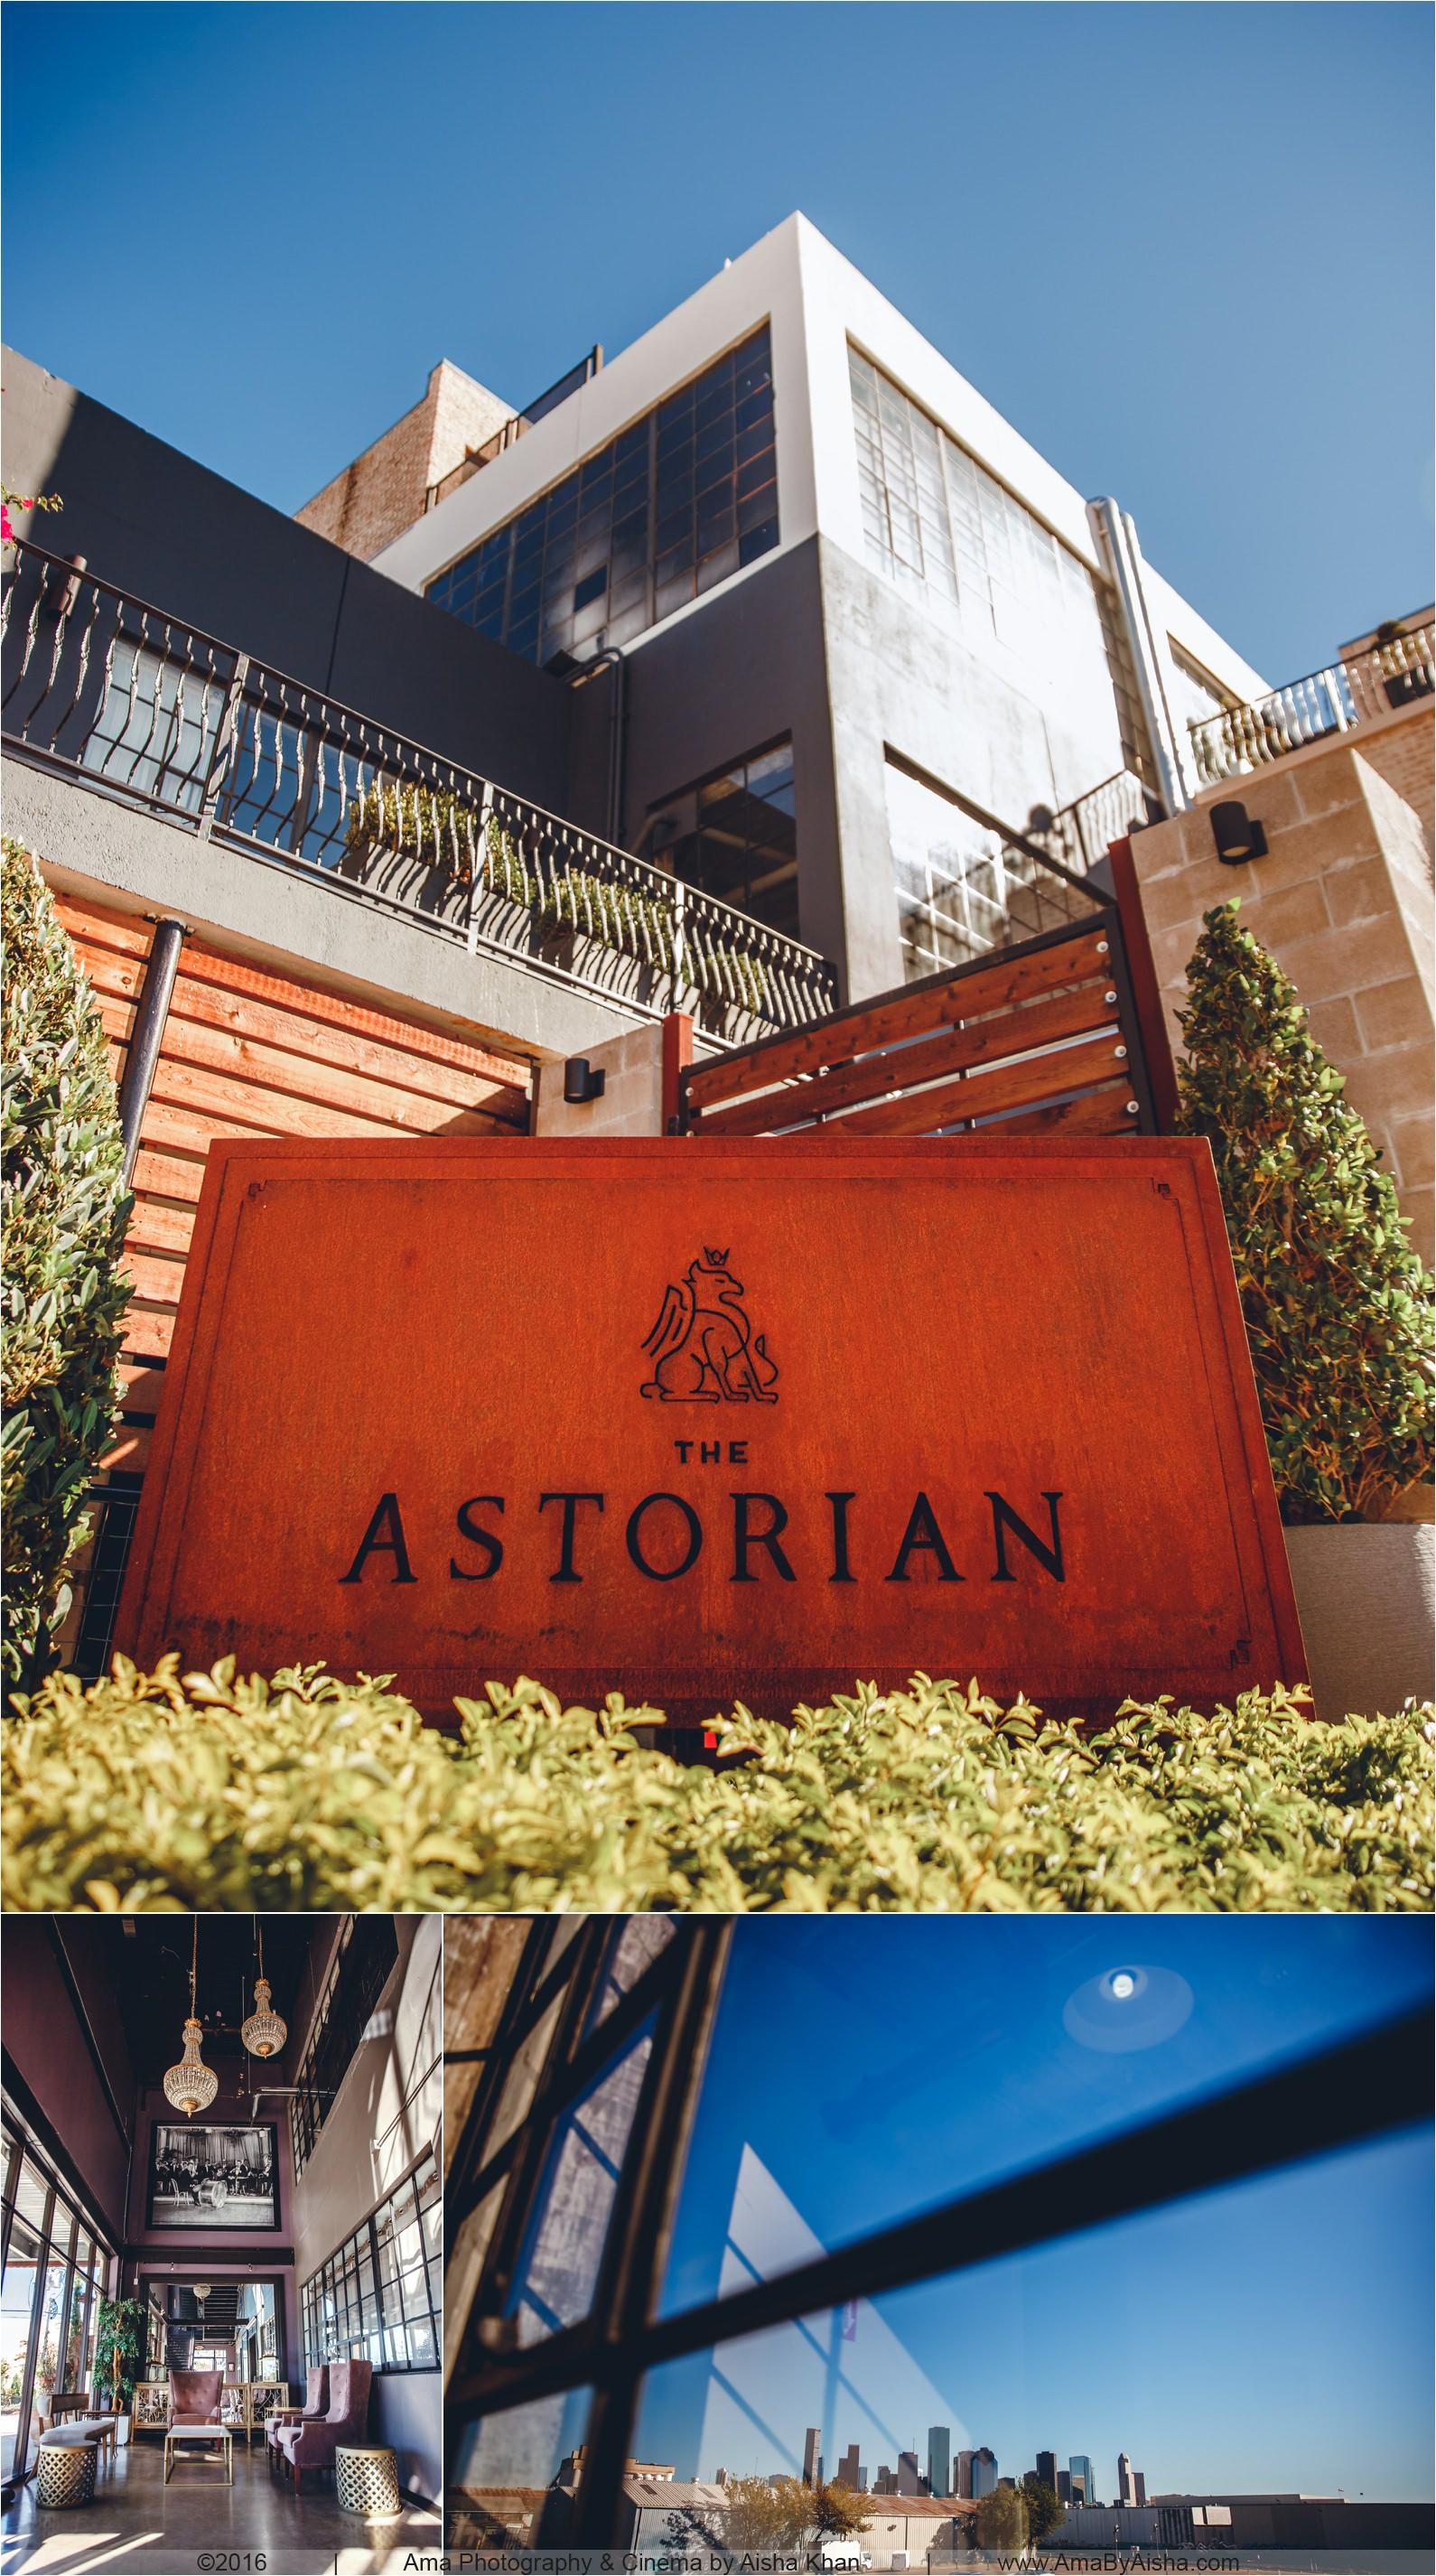 The Astorian wedding venue